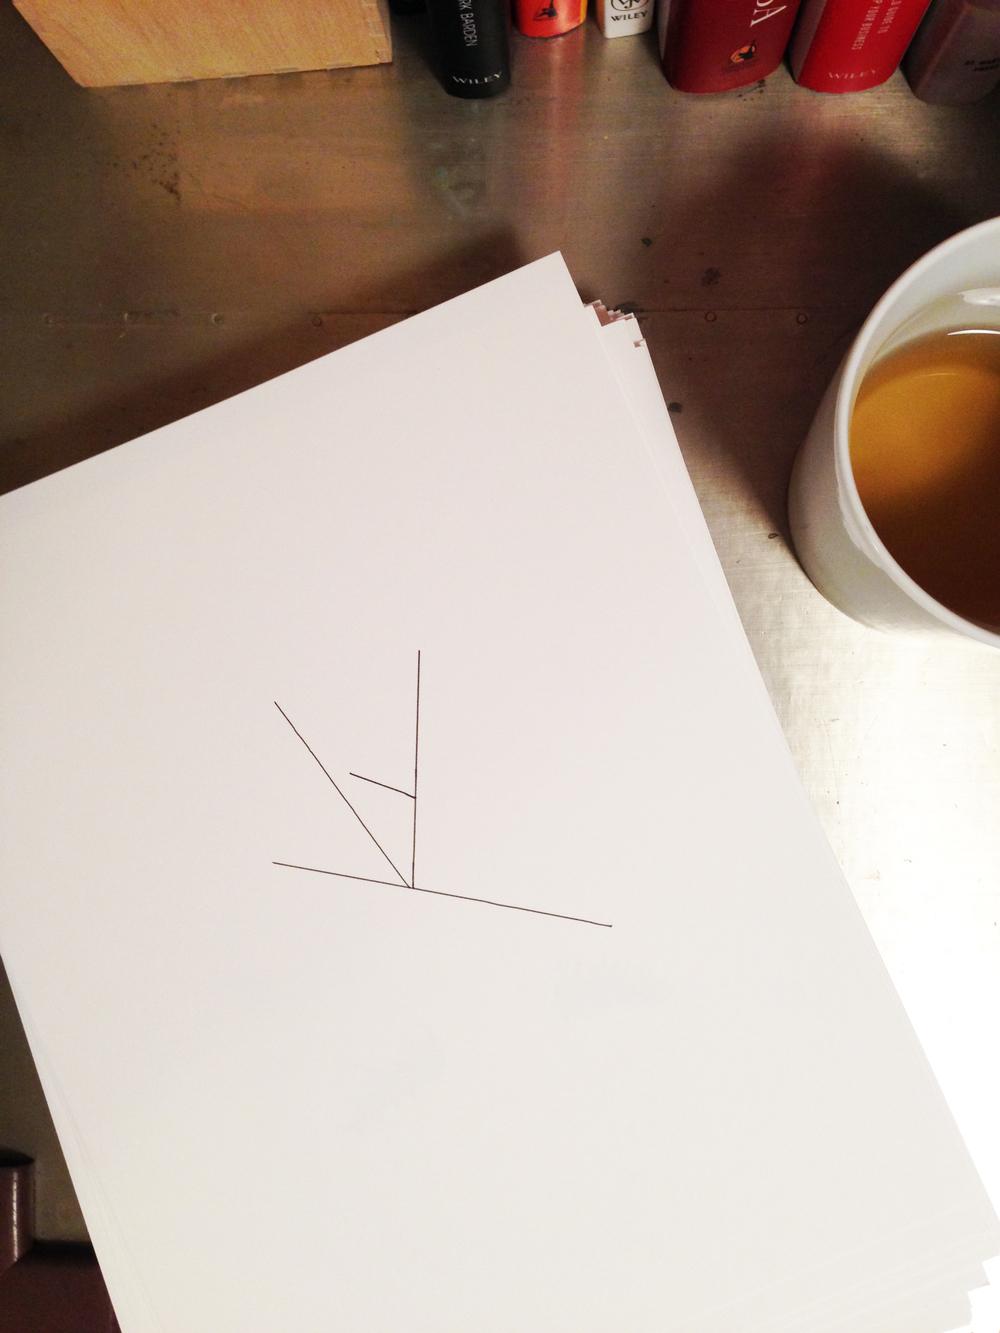 straight_line_3.jpg